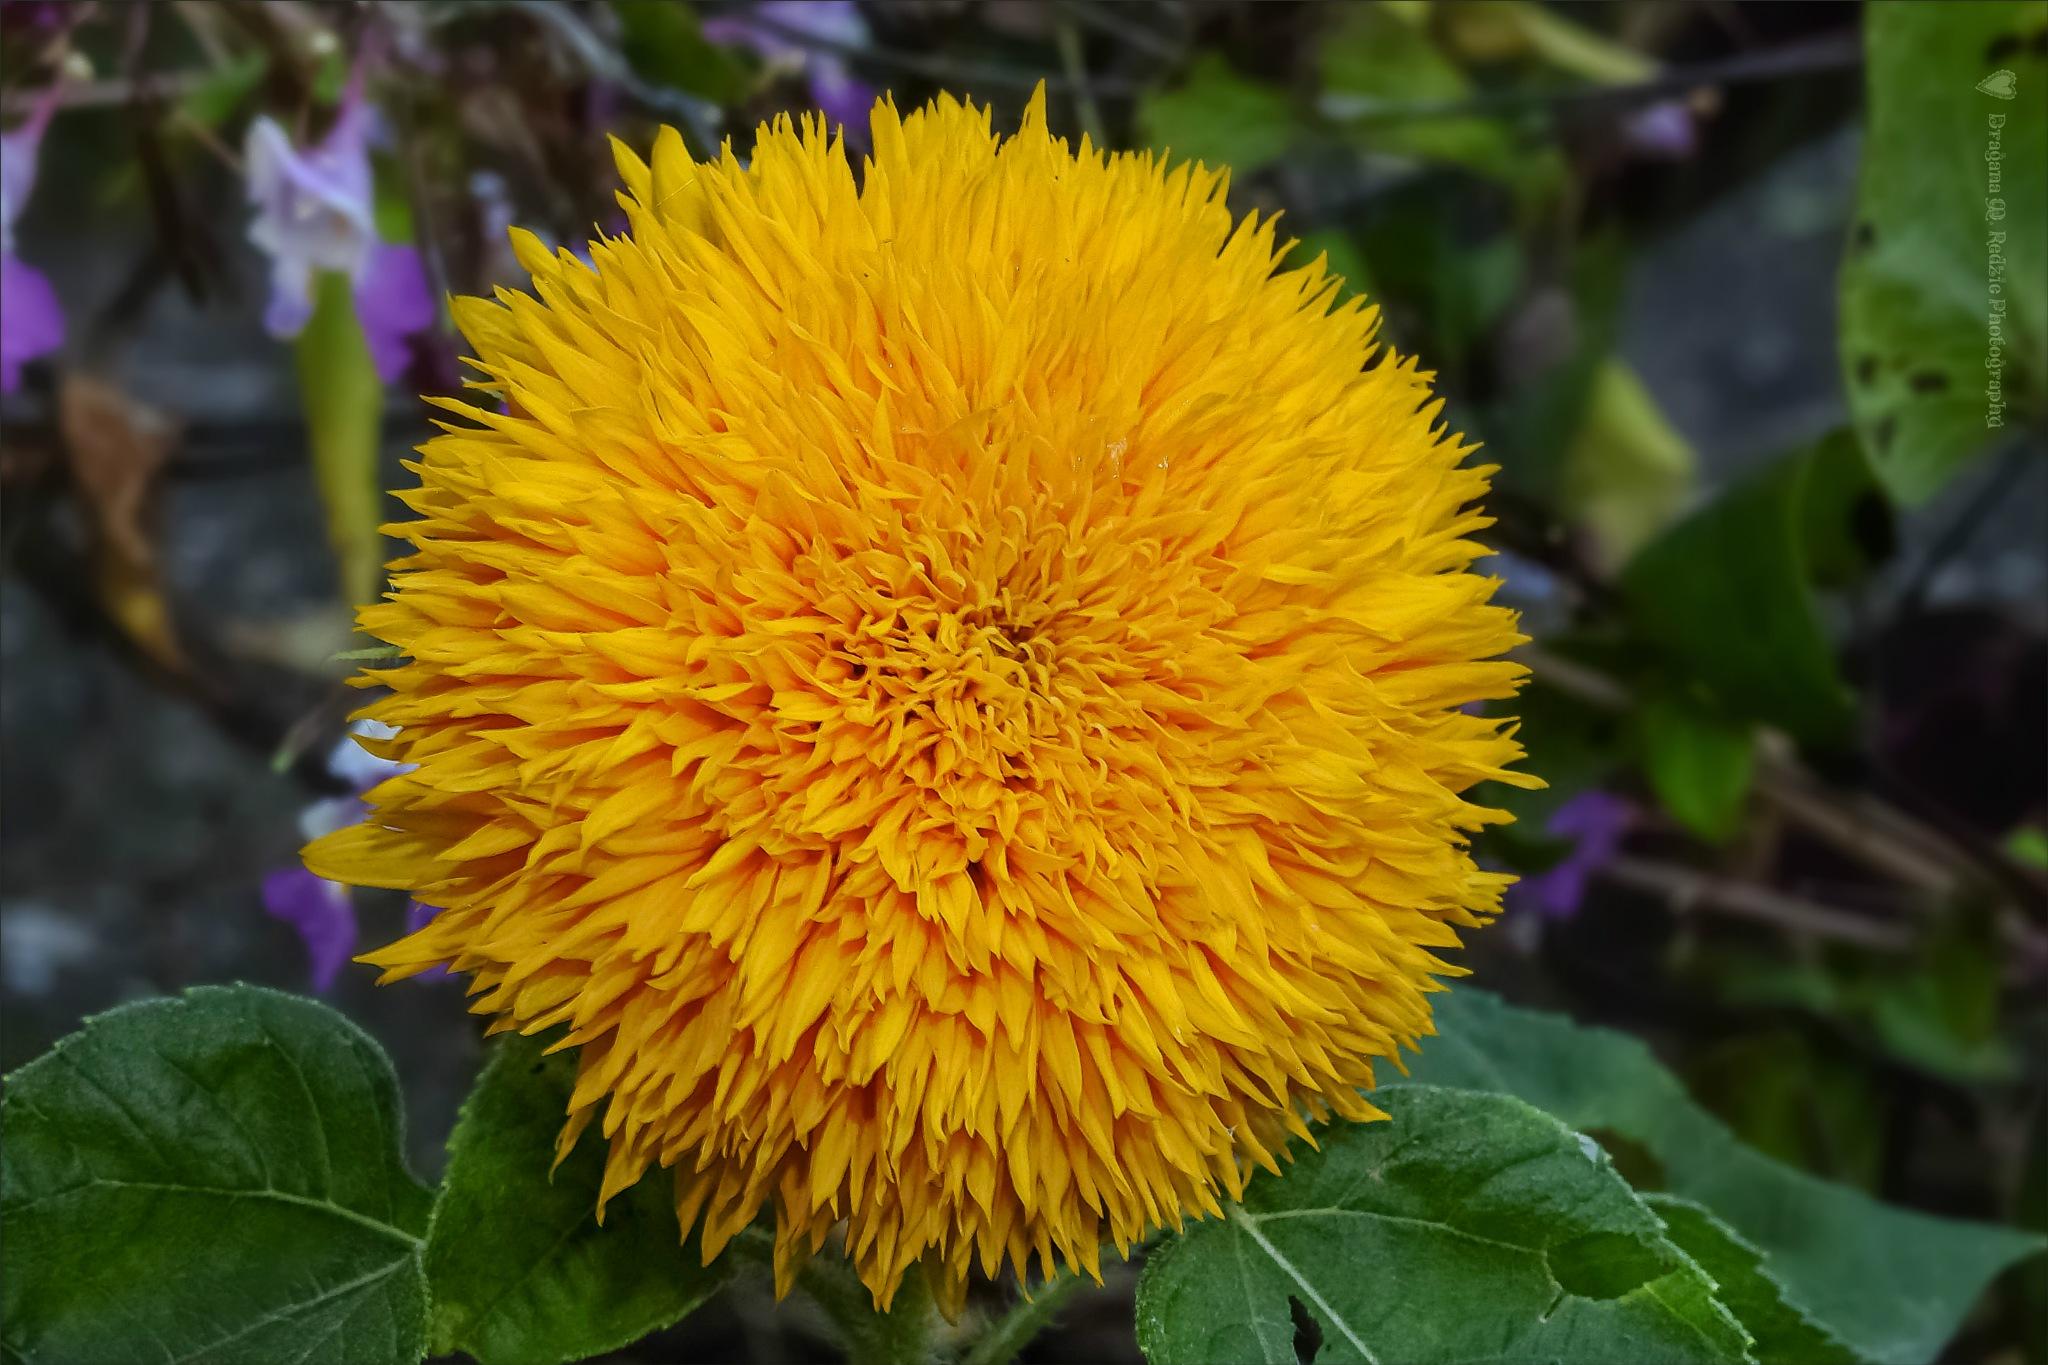 Ukrasni Suncokret - Decorative Sunflower ~ Helianthus annuus L. - Teddy Bear by Драгана М. Реџић